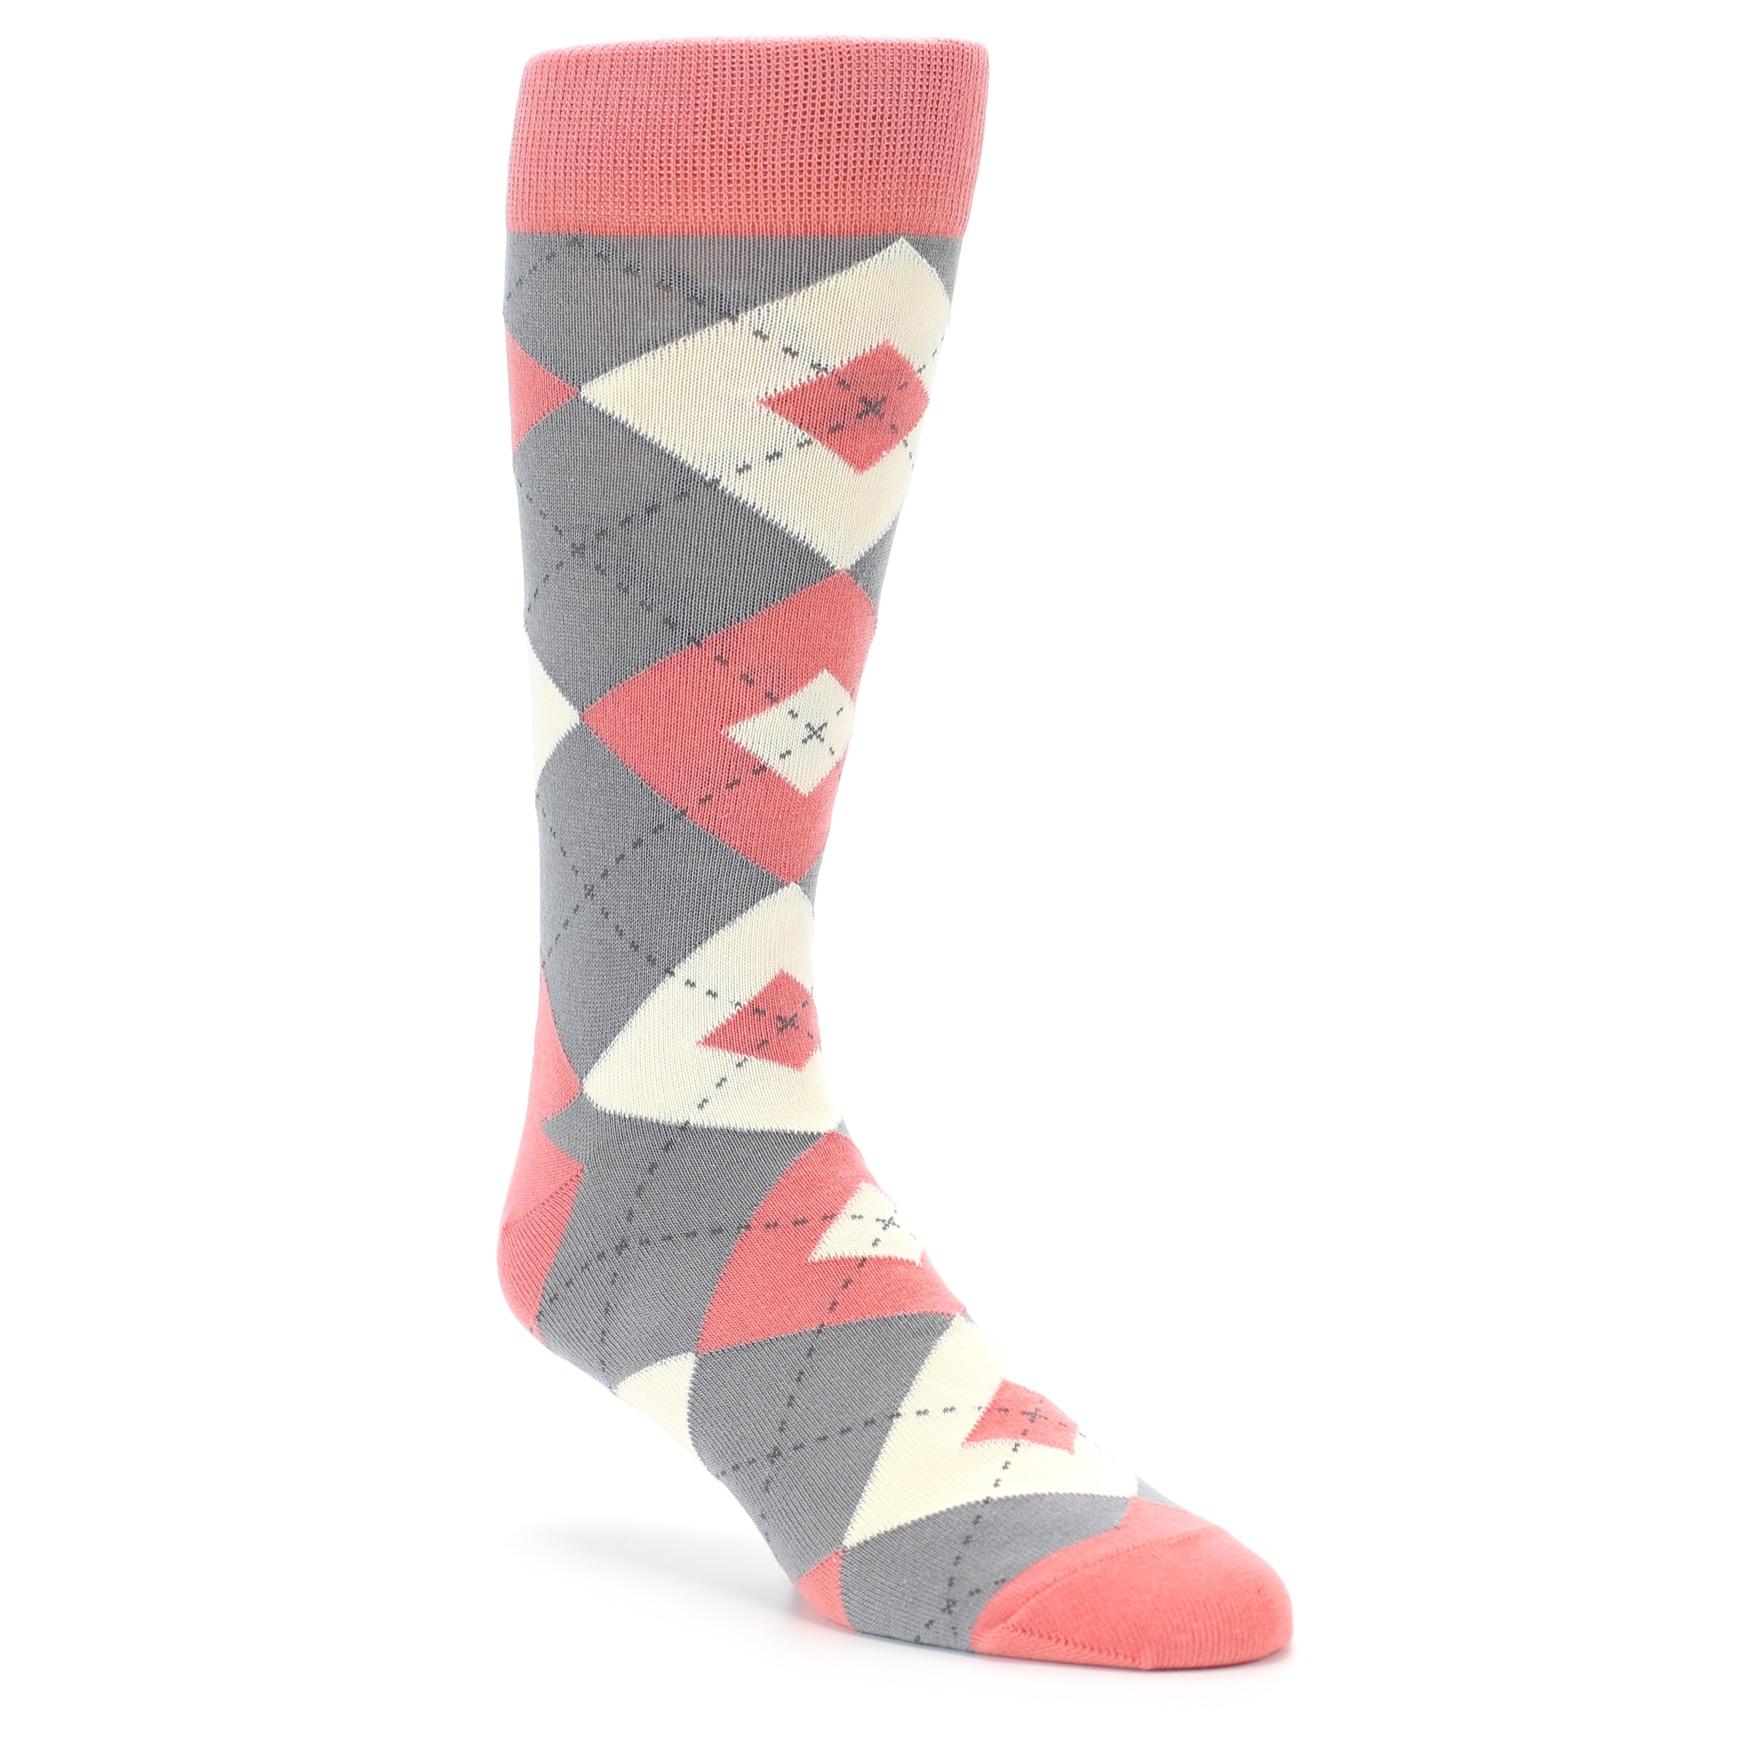 C And Grey Wedding Socks